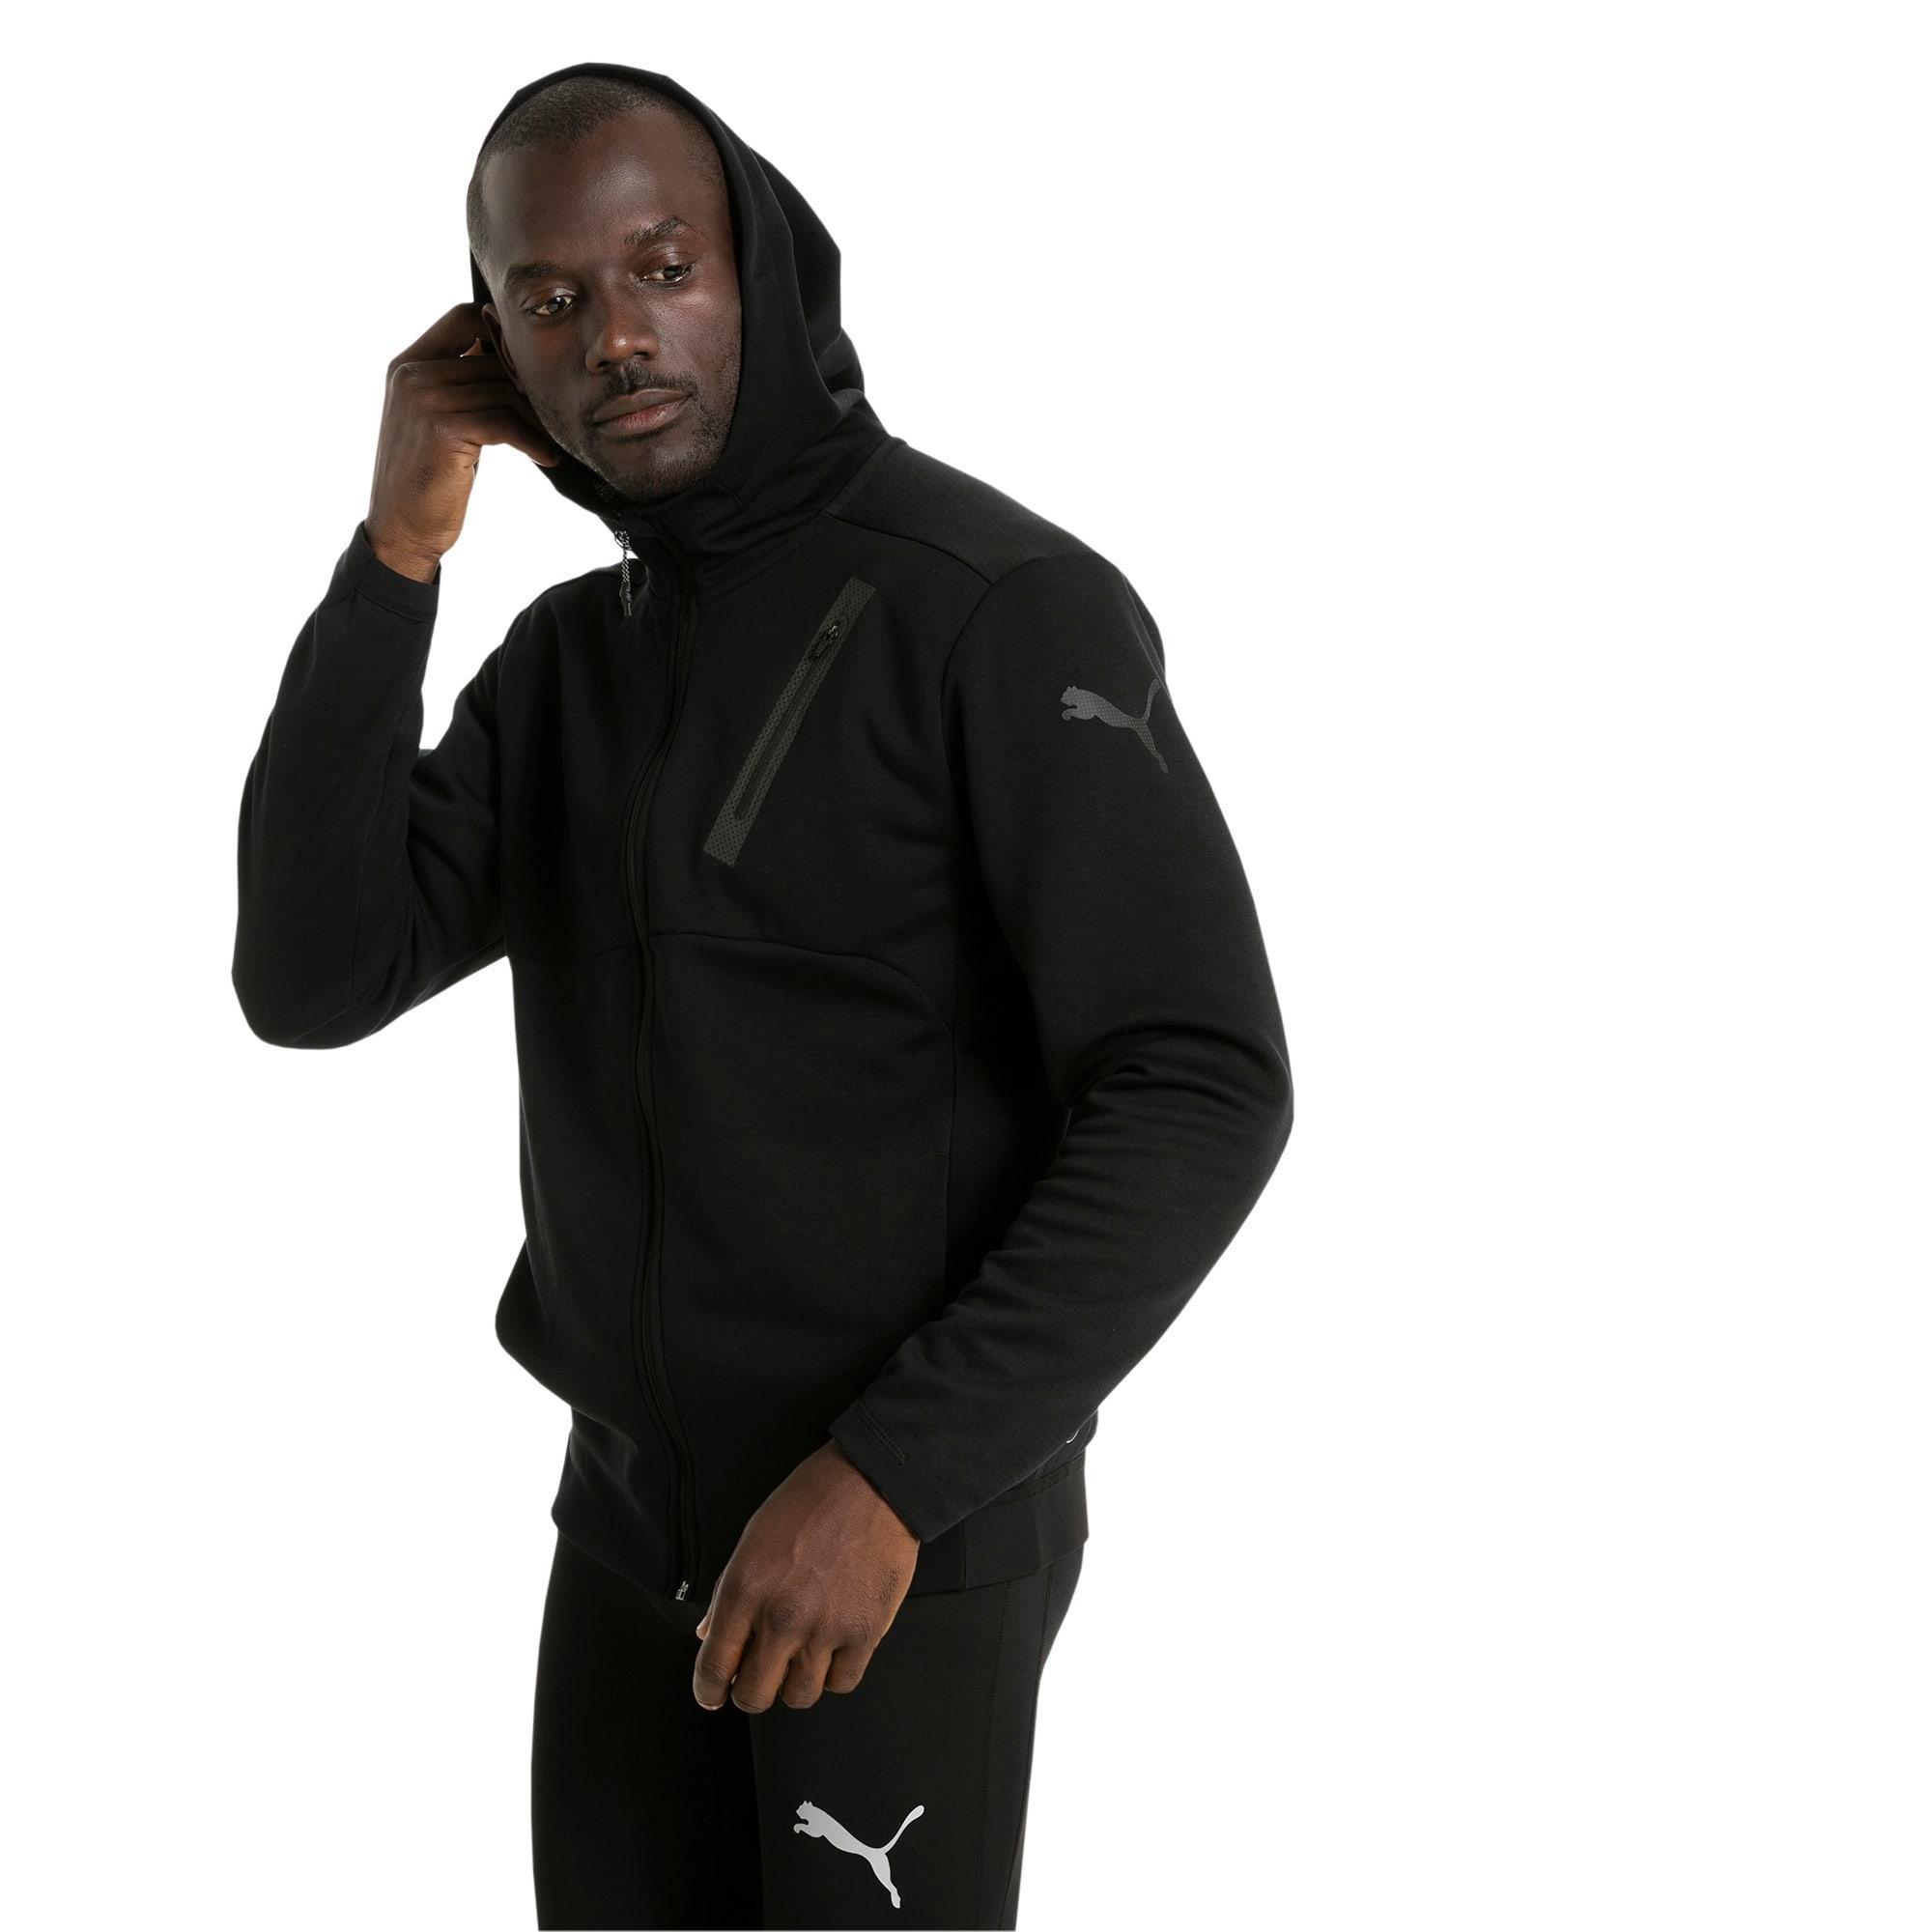 Thumbnail 2 of Active Training Men's Bonded Tech Jacket, Puma Black, medium-IND